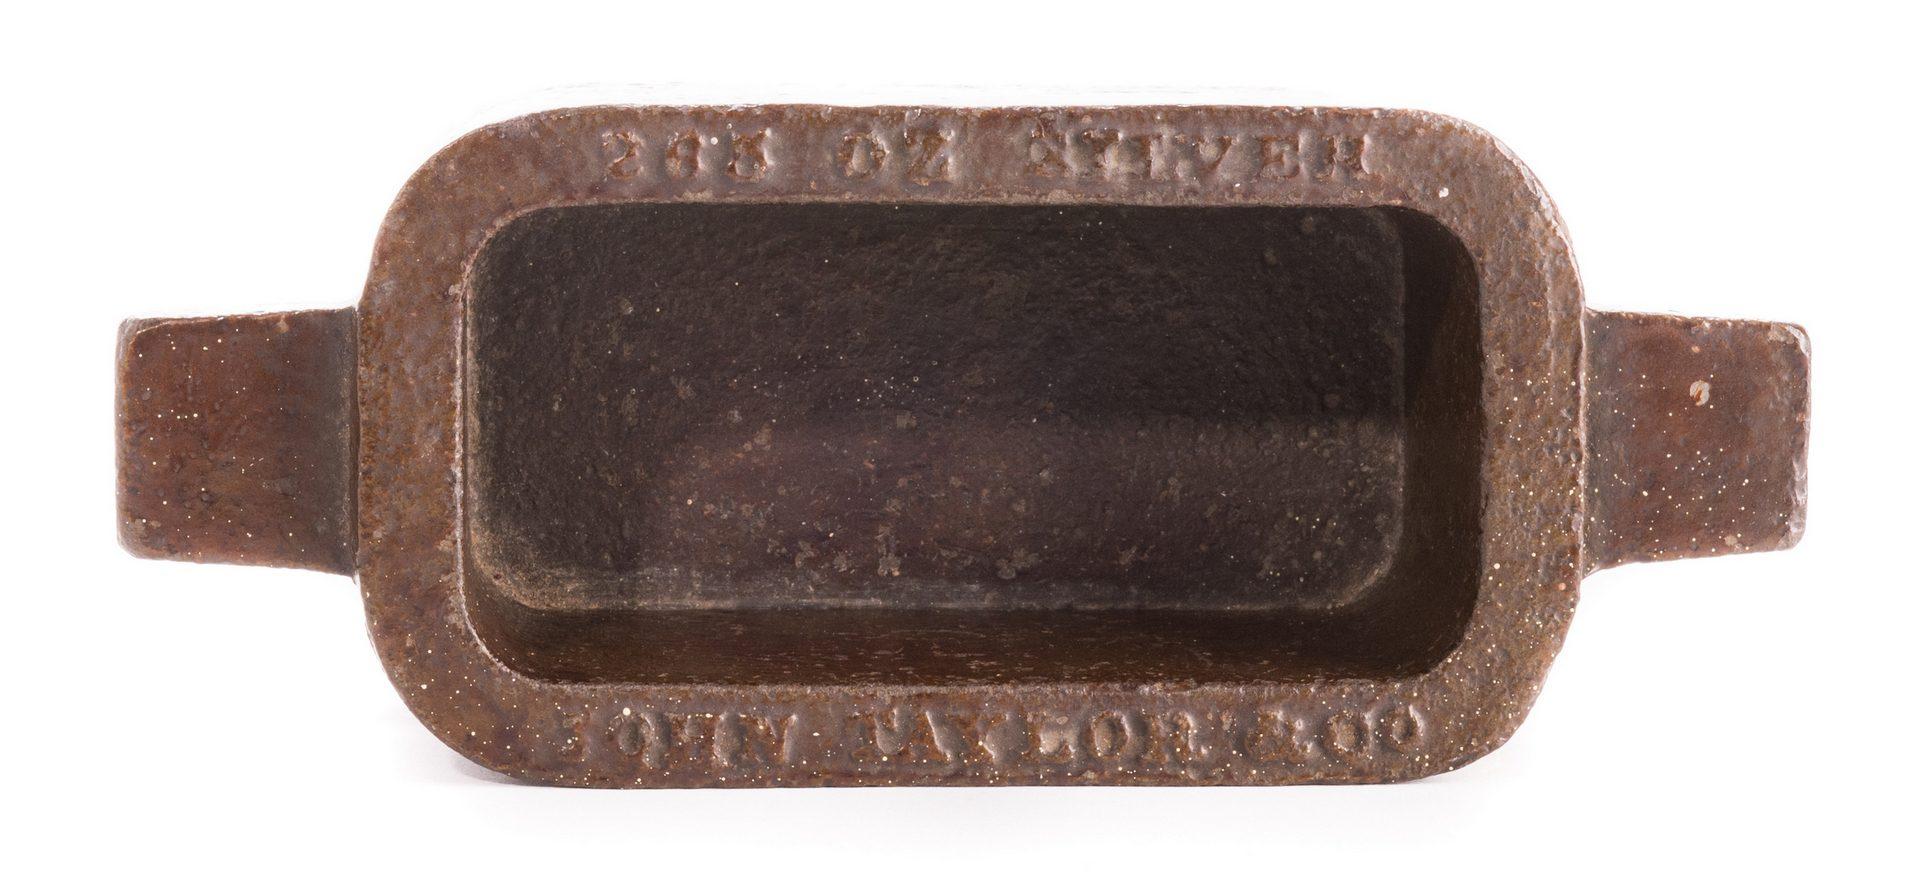 Lot 706: John Taylor & Co. Silver Ingot Mold